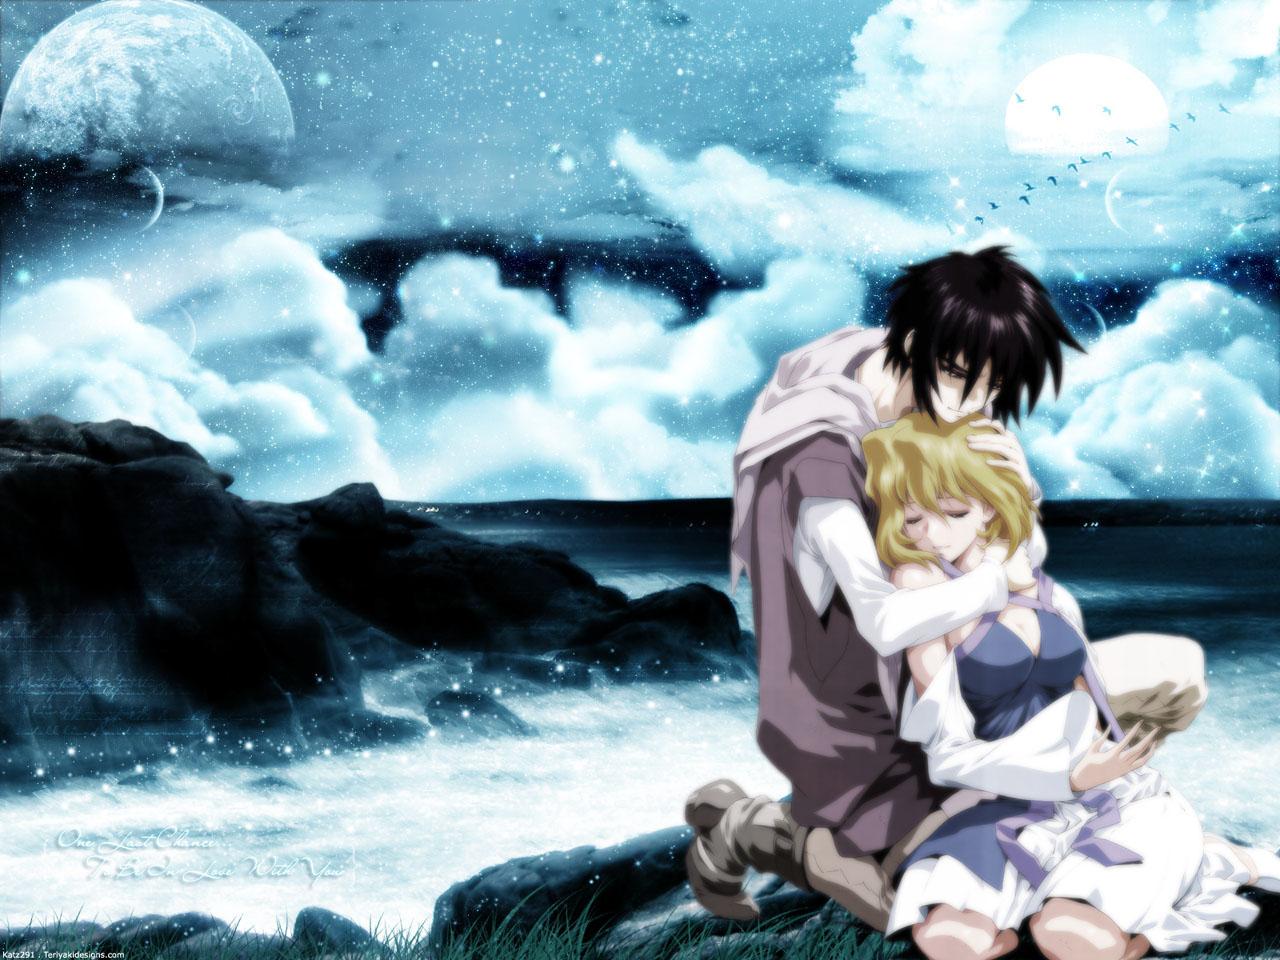 Anime Couples anime couples 27914022 1280 960